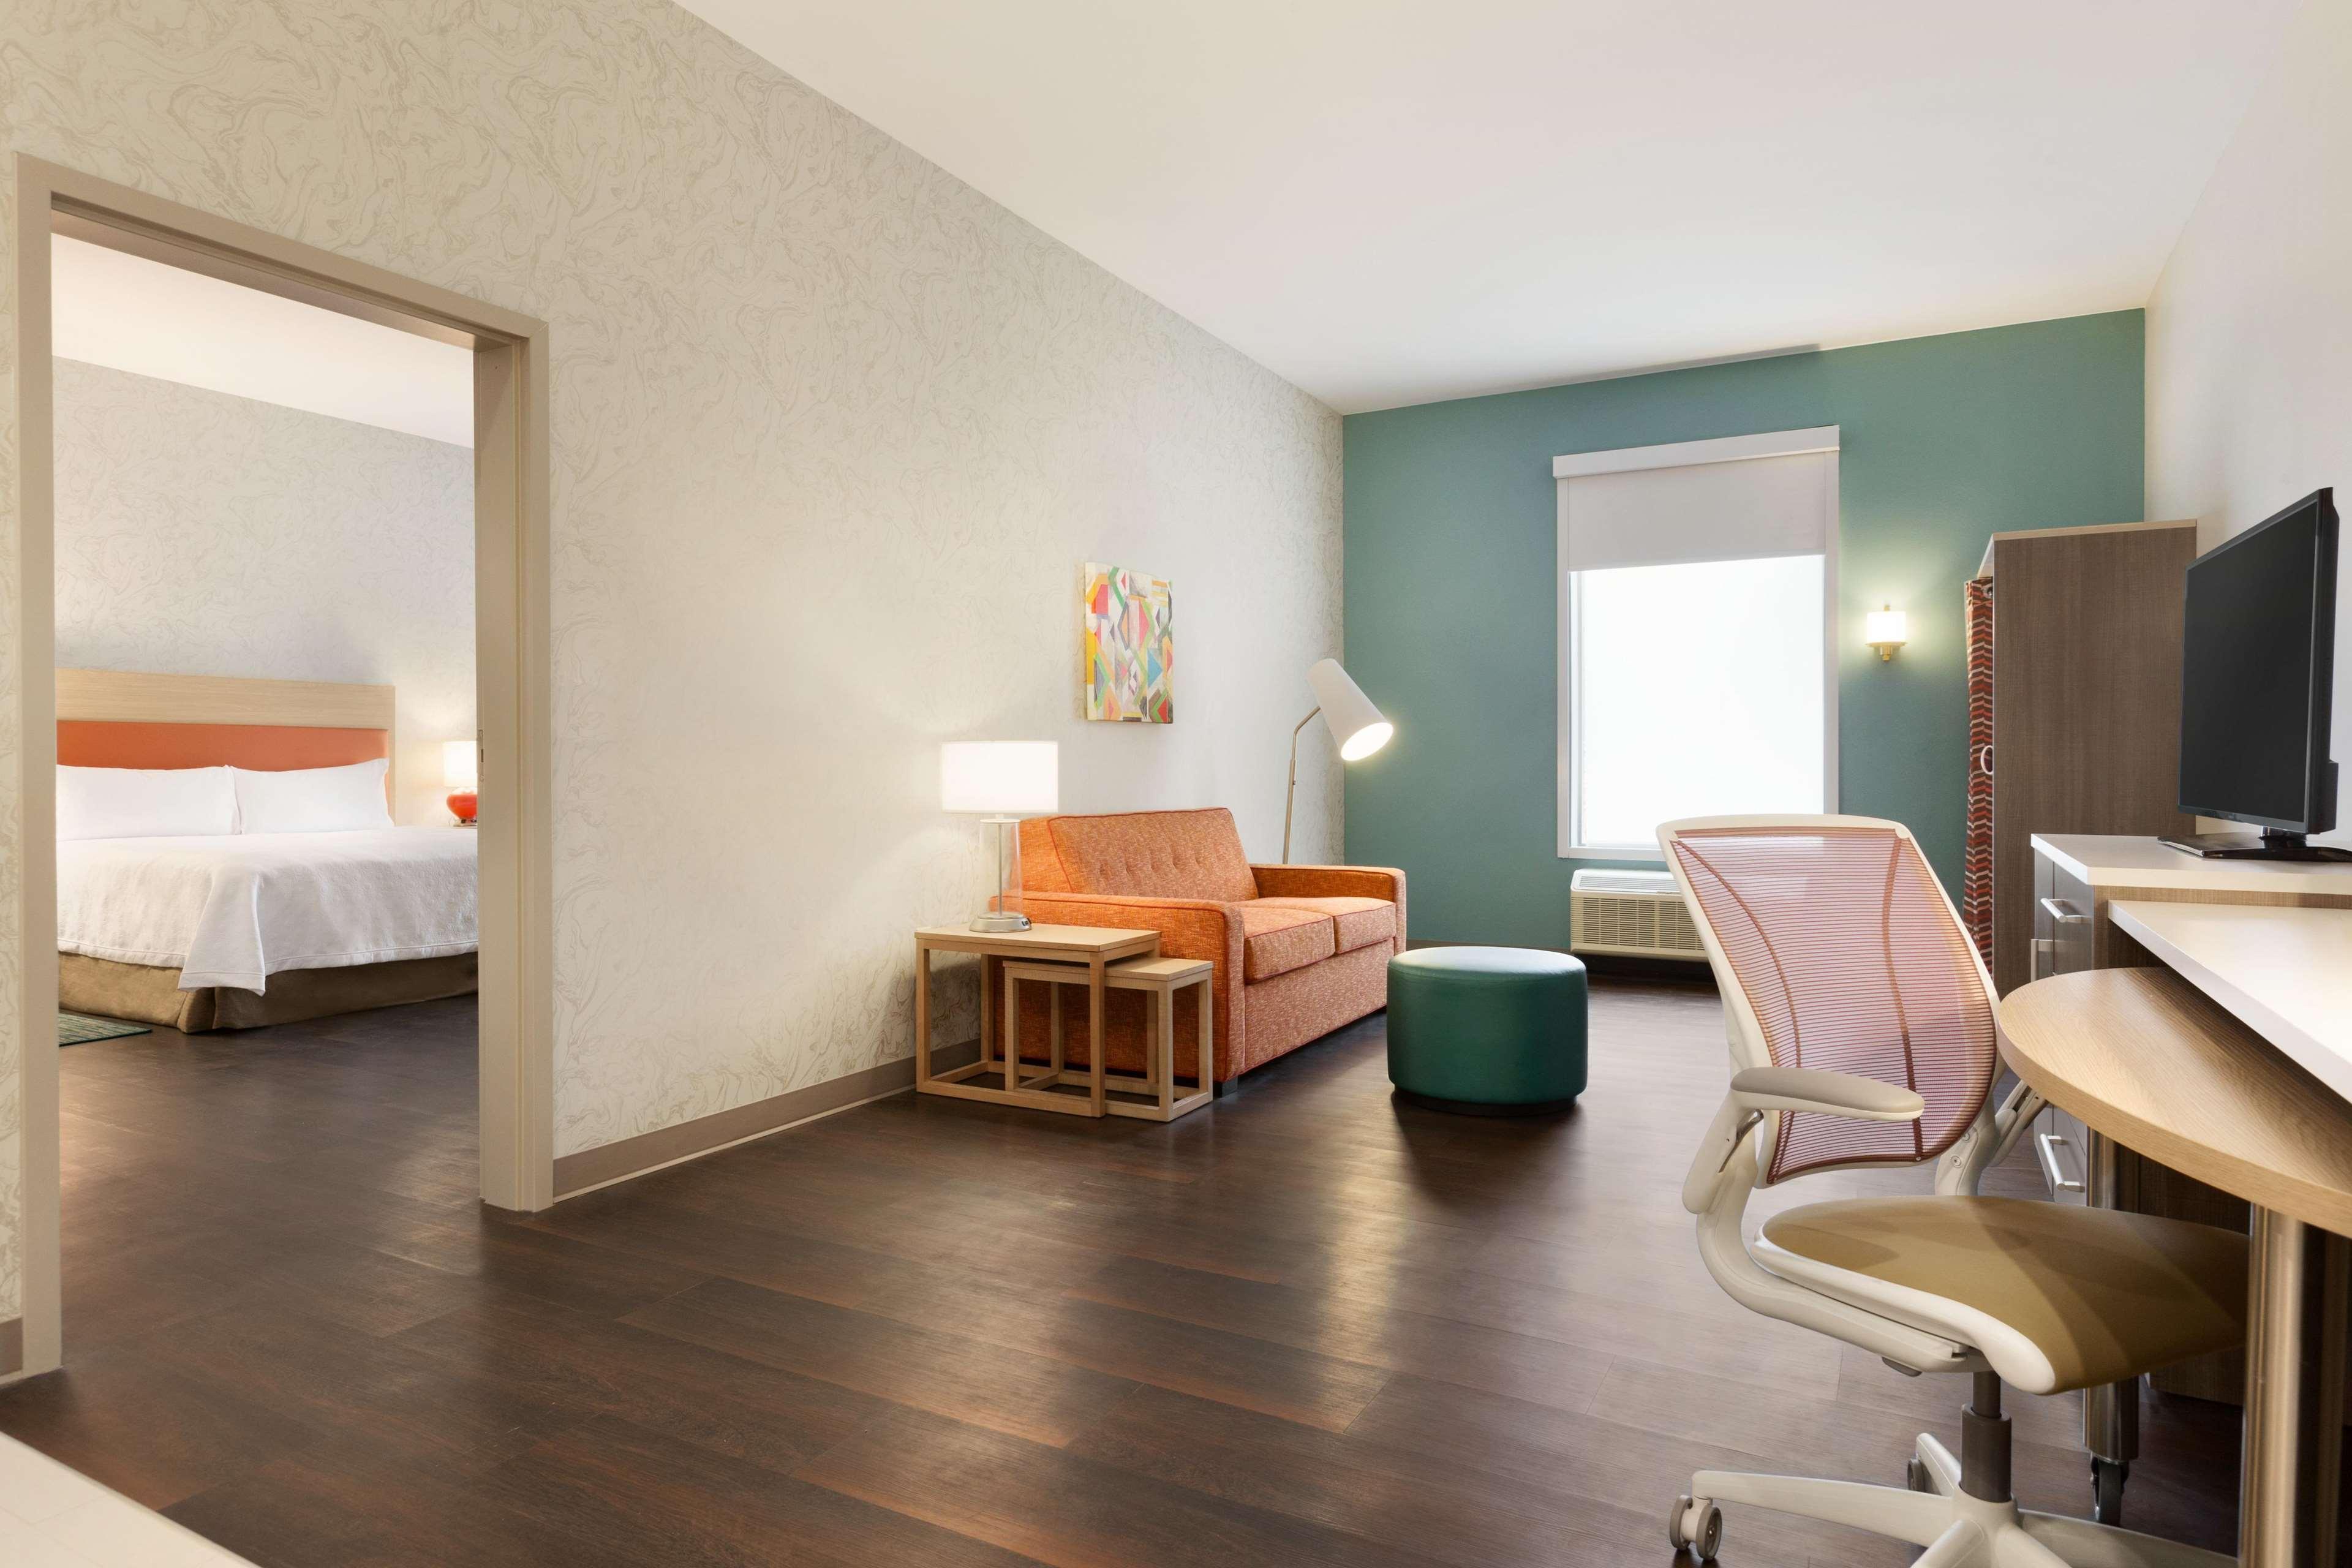 Home2 Suites by Hilton Florence Cincinnati Airport South image 22